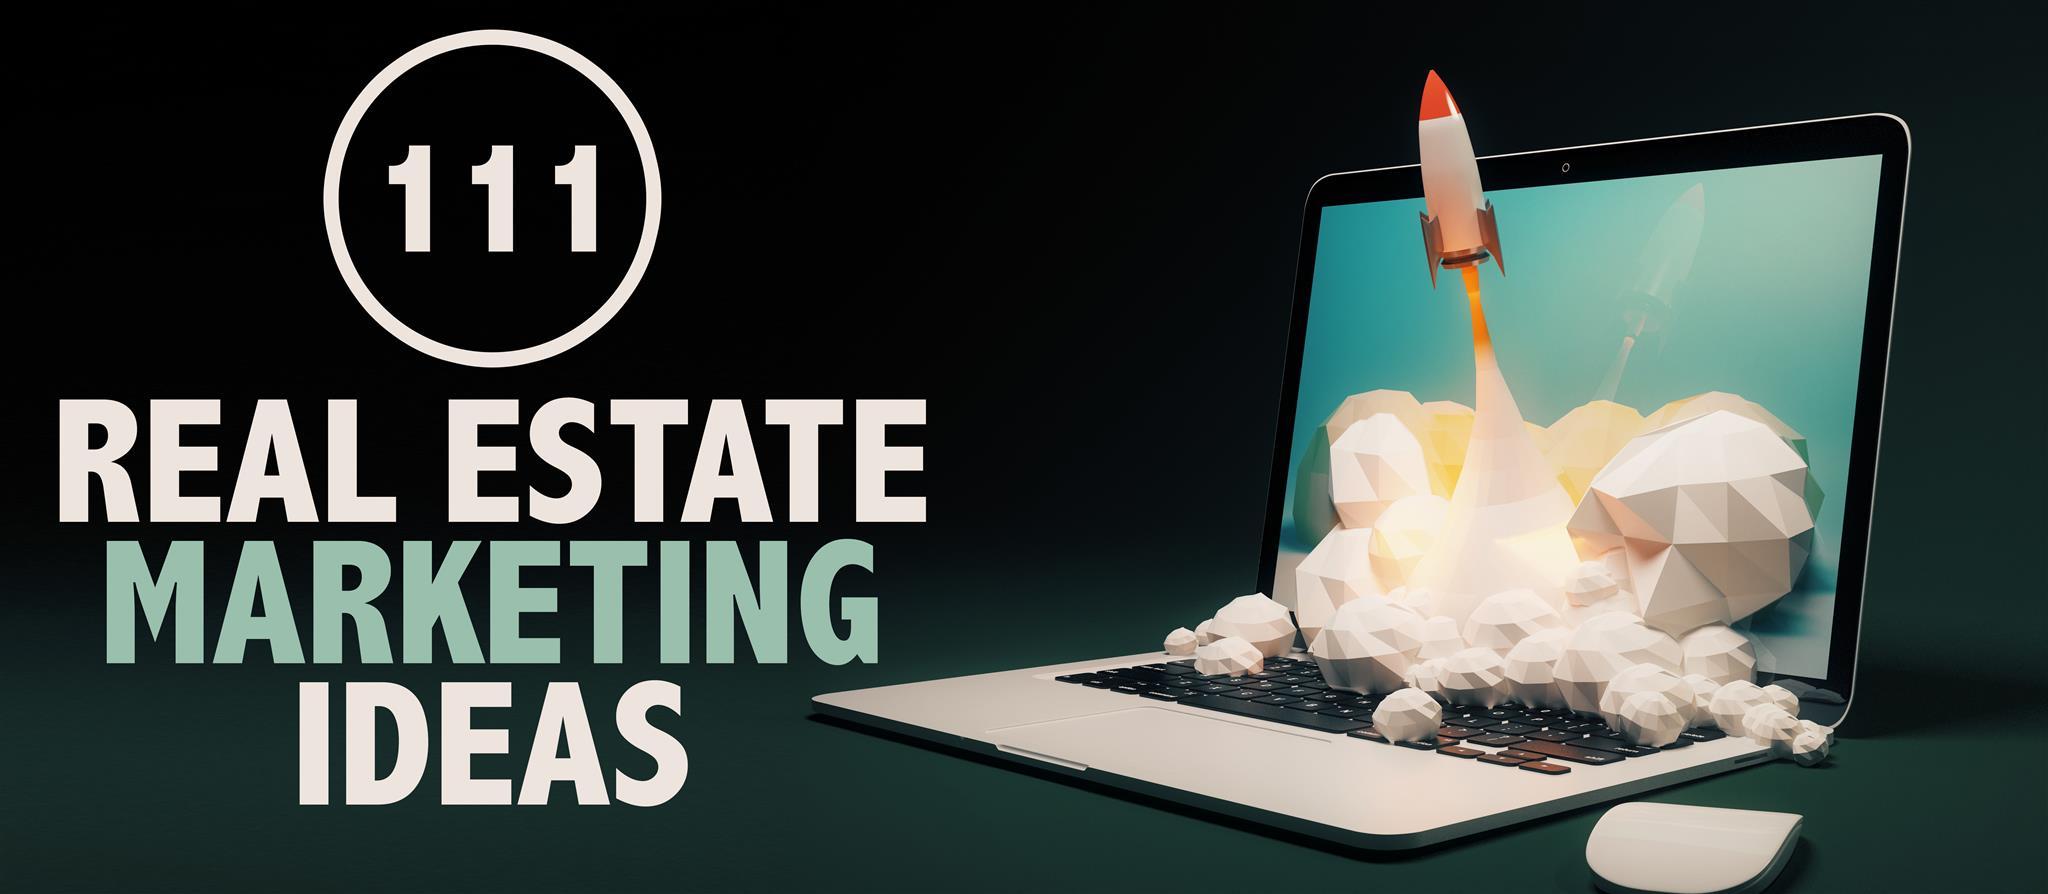 111-real-estate-marketing-ideas